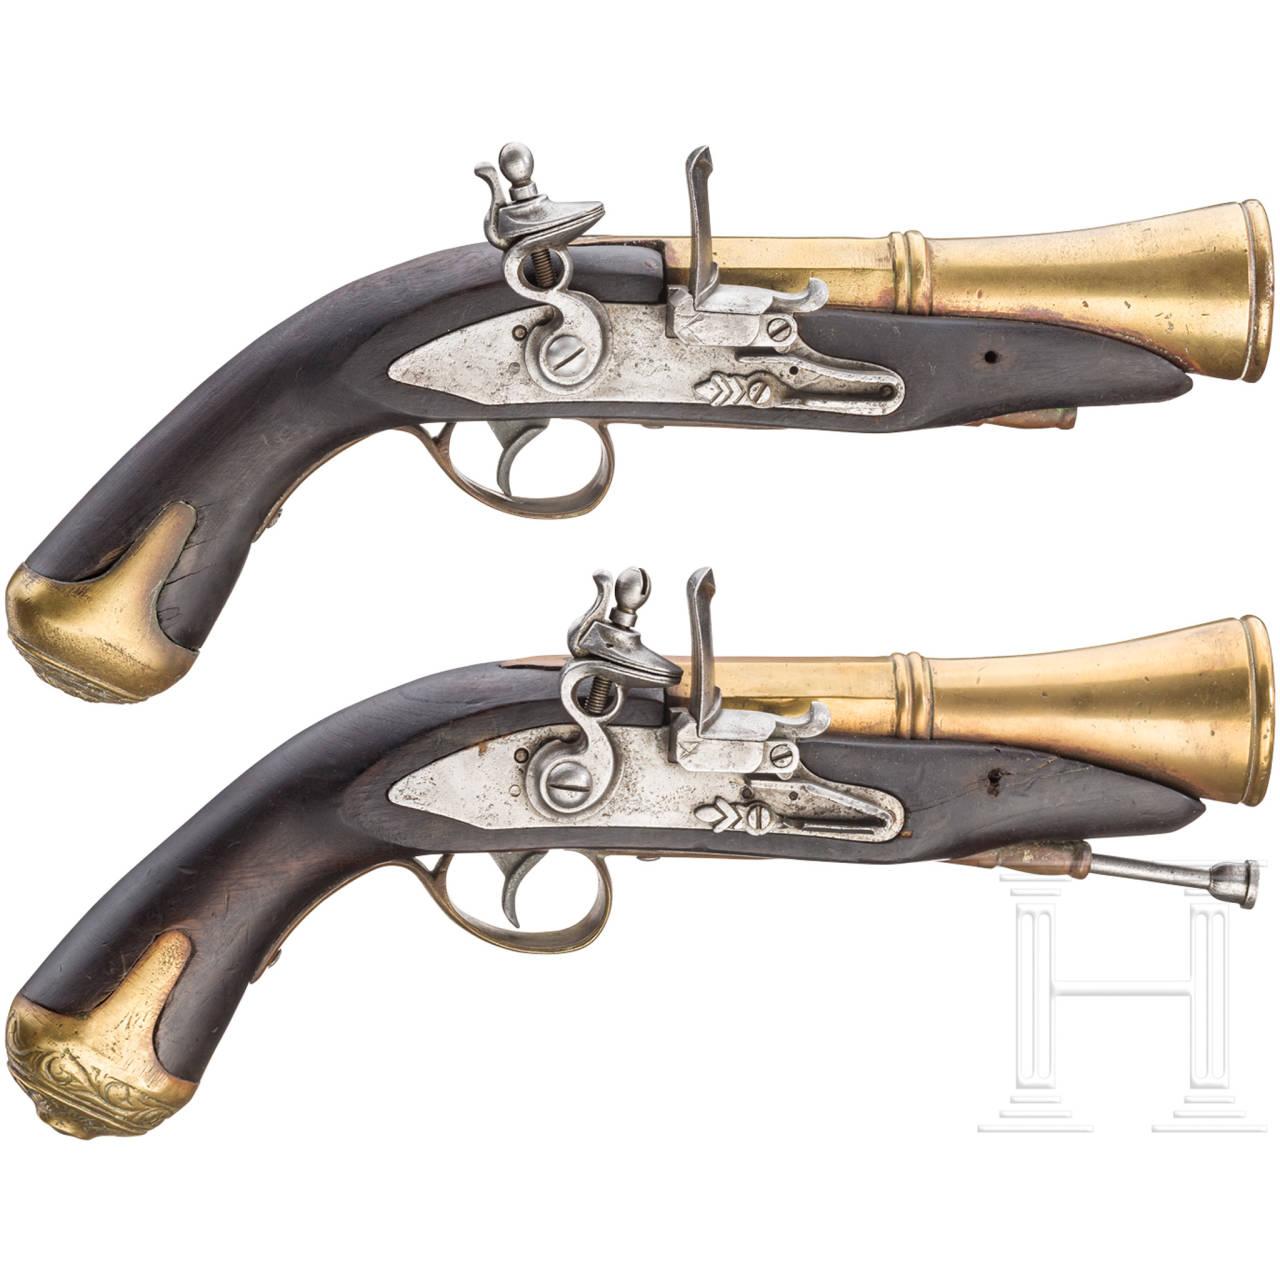 A pair of Spanish flintlock blunderbuss pistols, 20th century